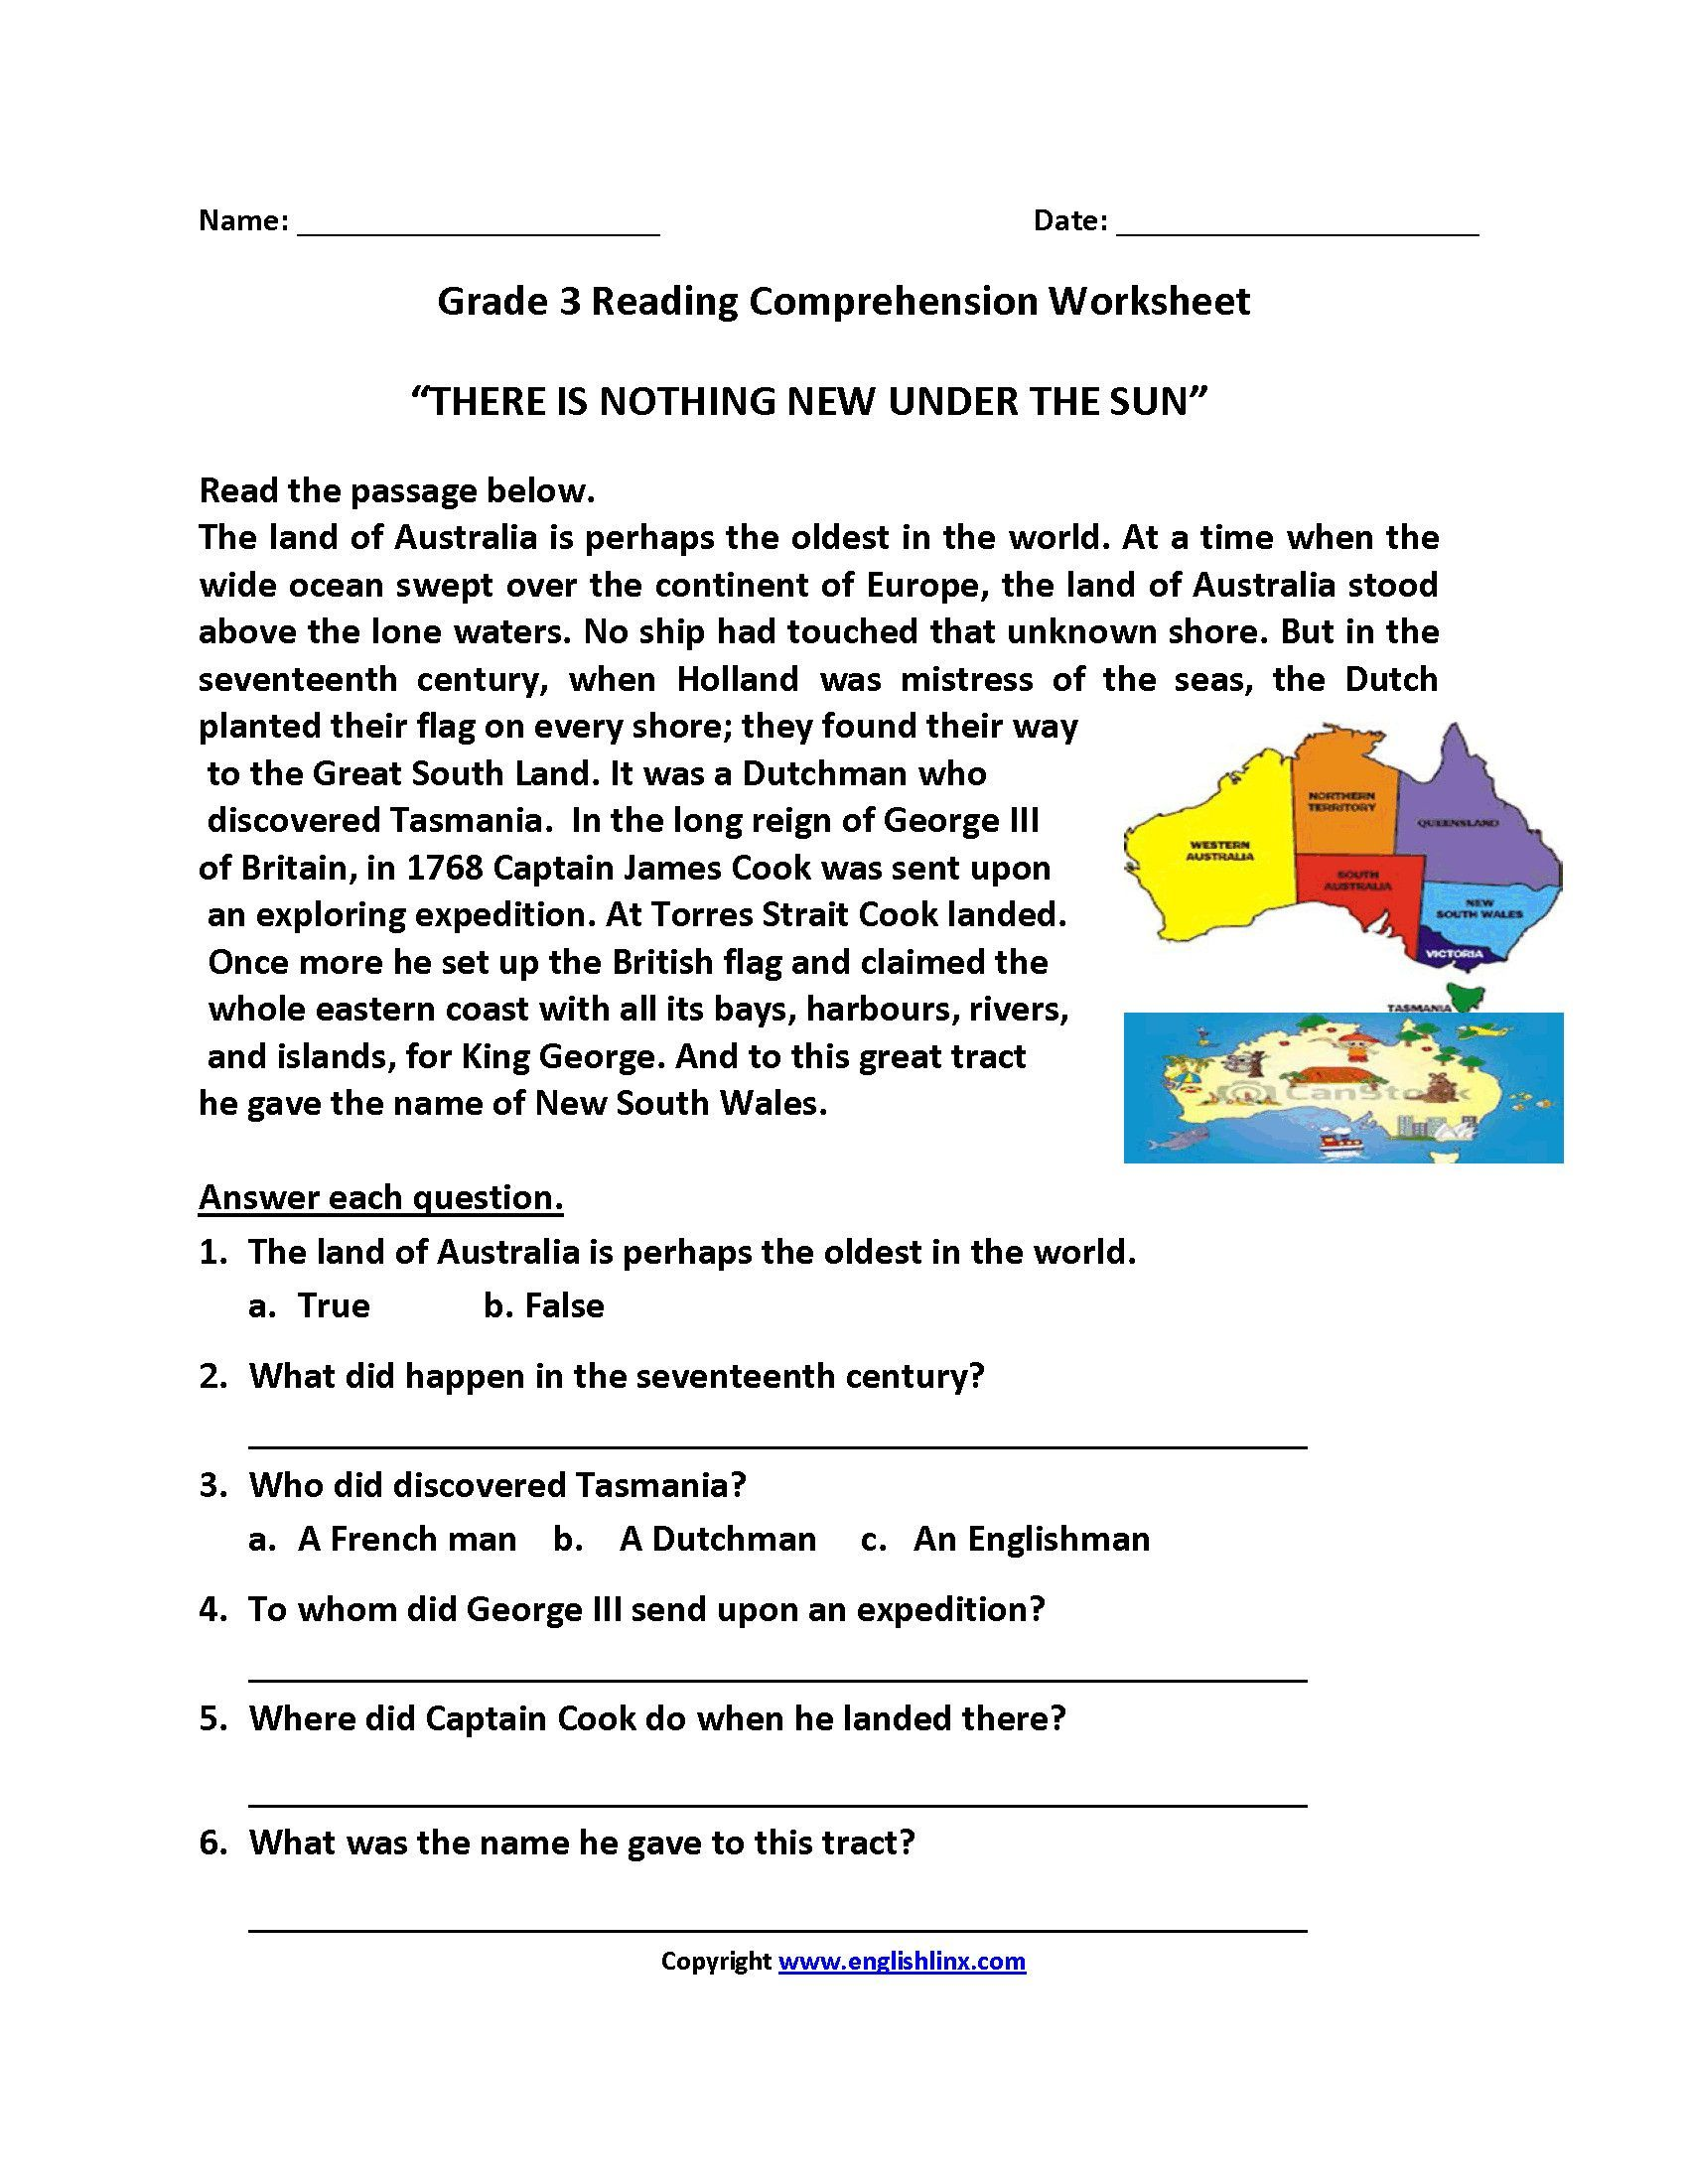 38 Innovative Reading Comprehension Worksheets Design Ideas Bacamajalah Com In 2020 4th Grade Reading Worksheets Reading Worksheets Third Grade Reading Worksheets